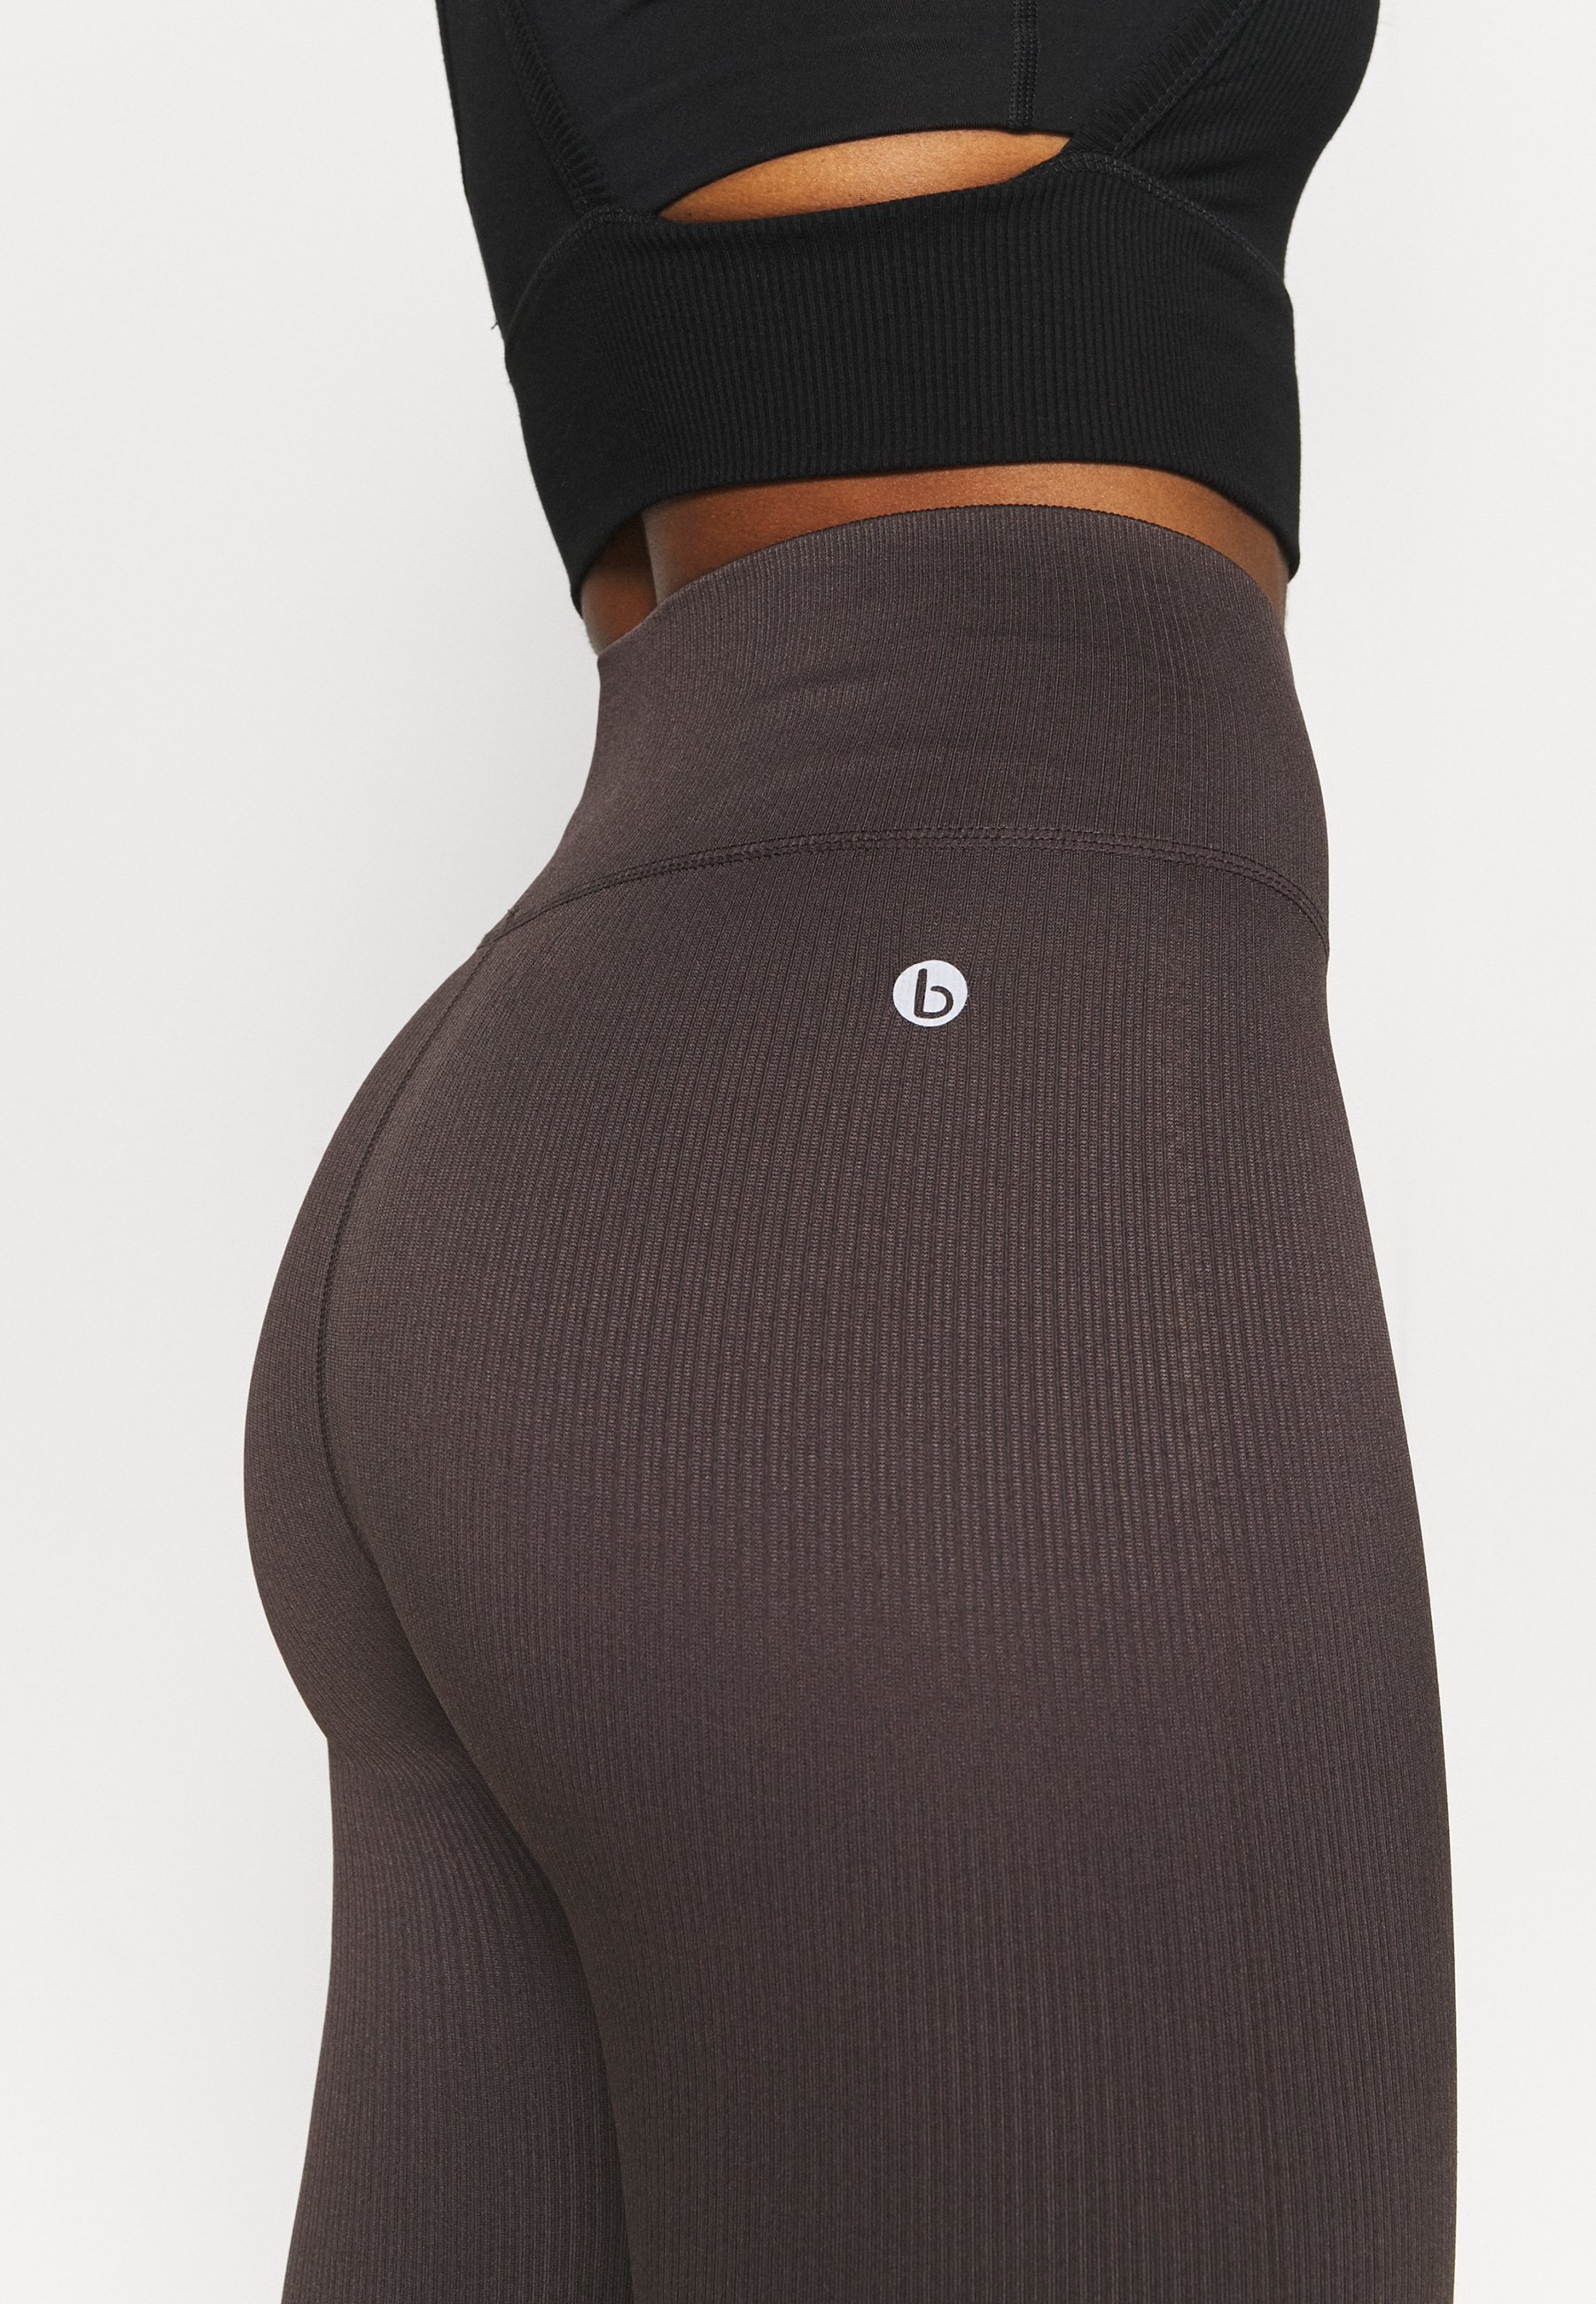 Femme SEAMLESS HI LOW 7/8 - Collants